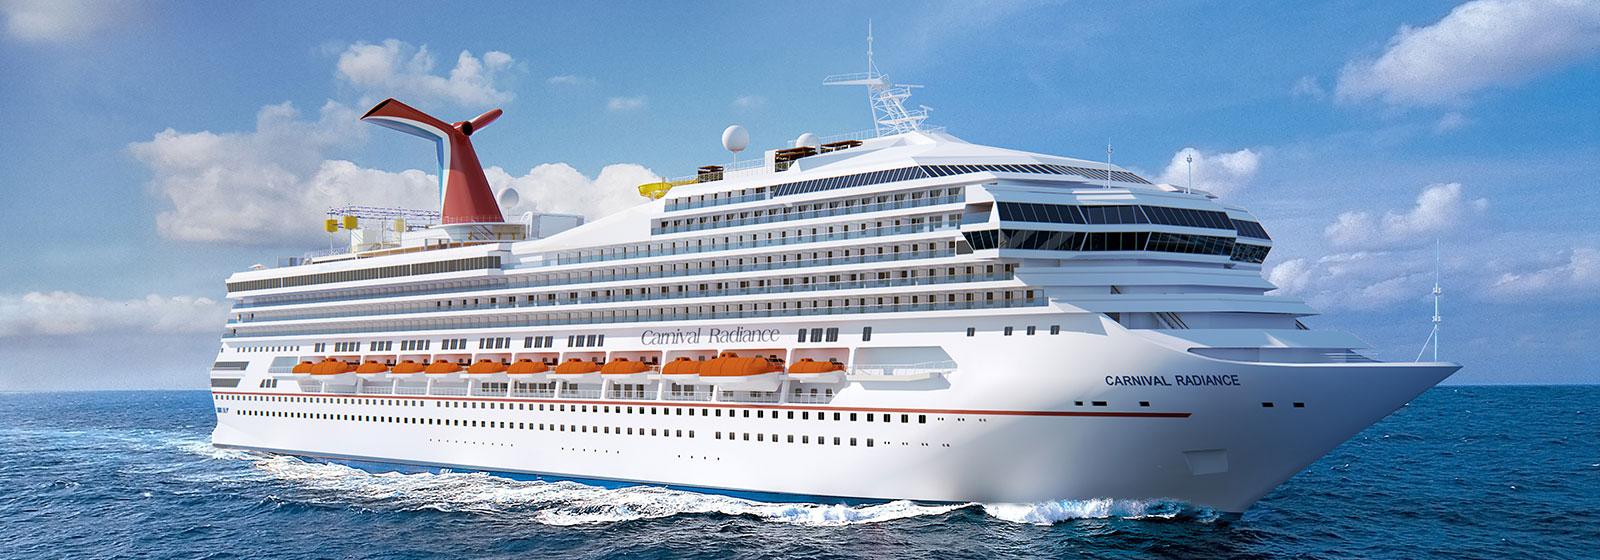 Radiance - Carnival Cruises